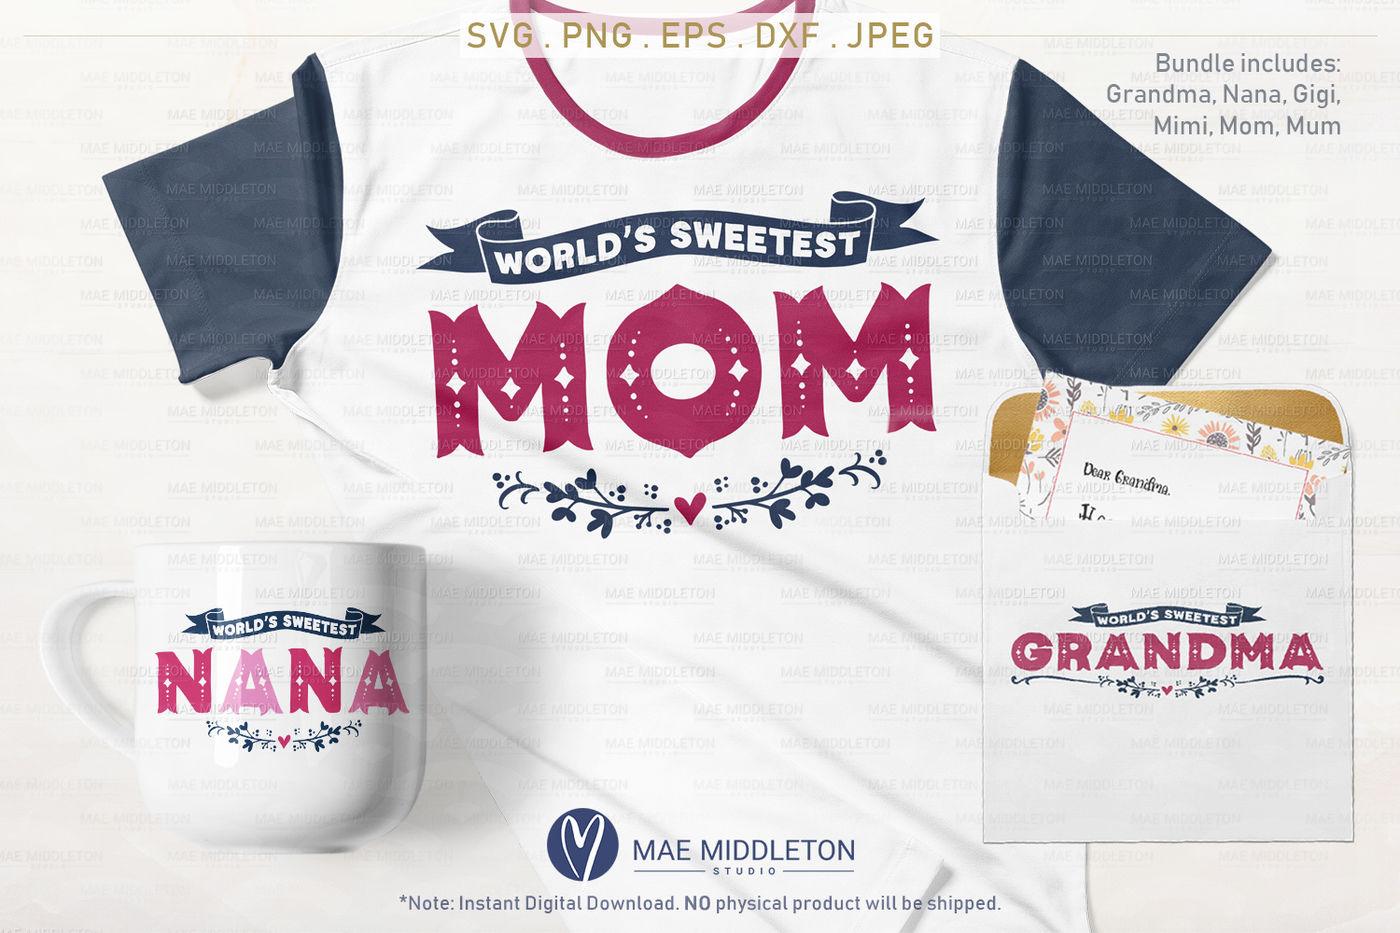 World S Sweetest Grandma Nana Gigi Mimi Mom Mum Svg Files